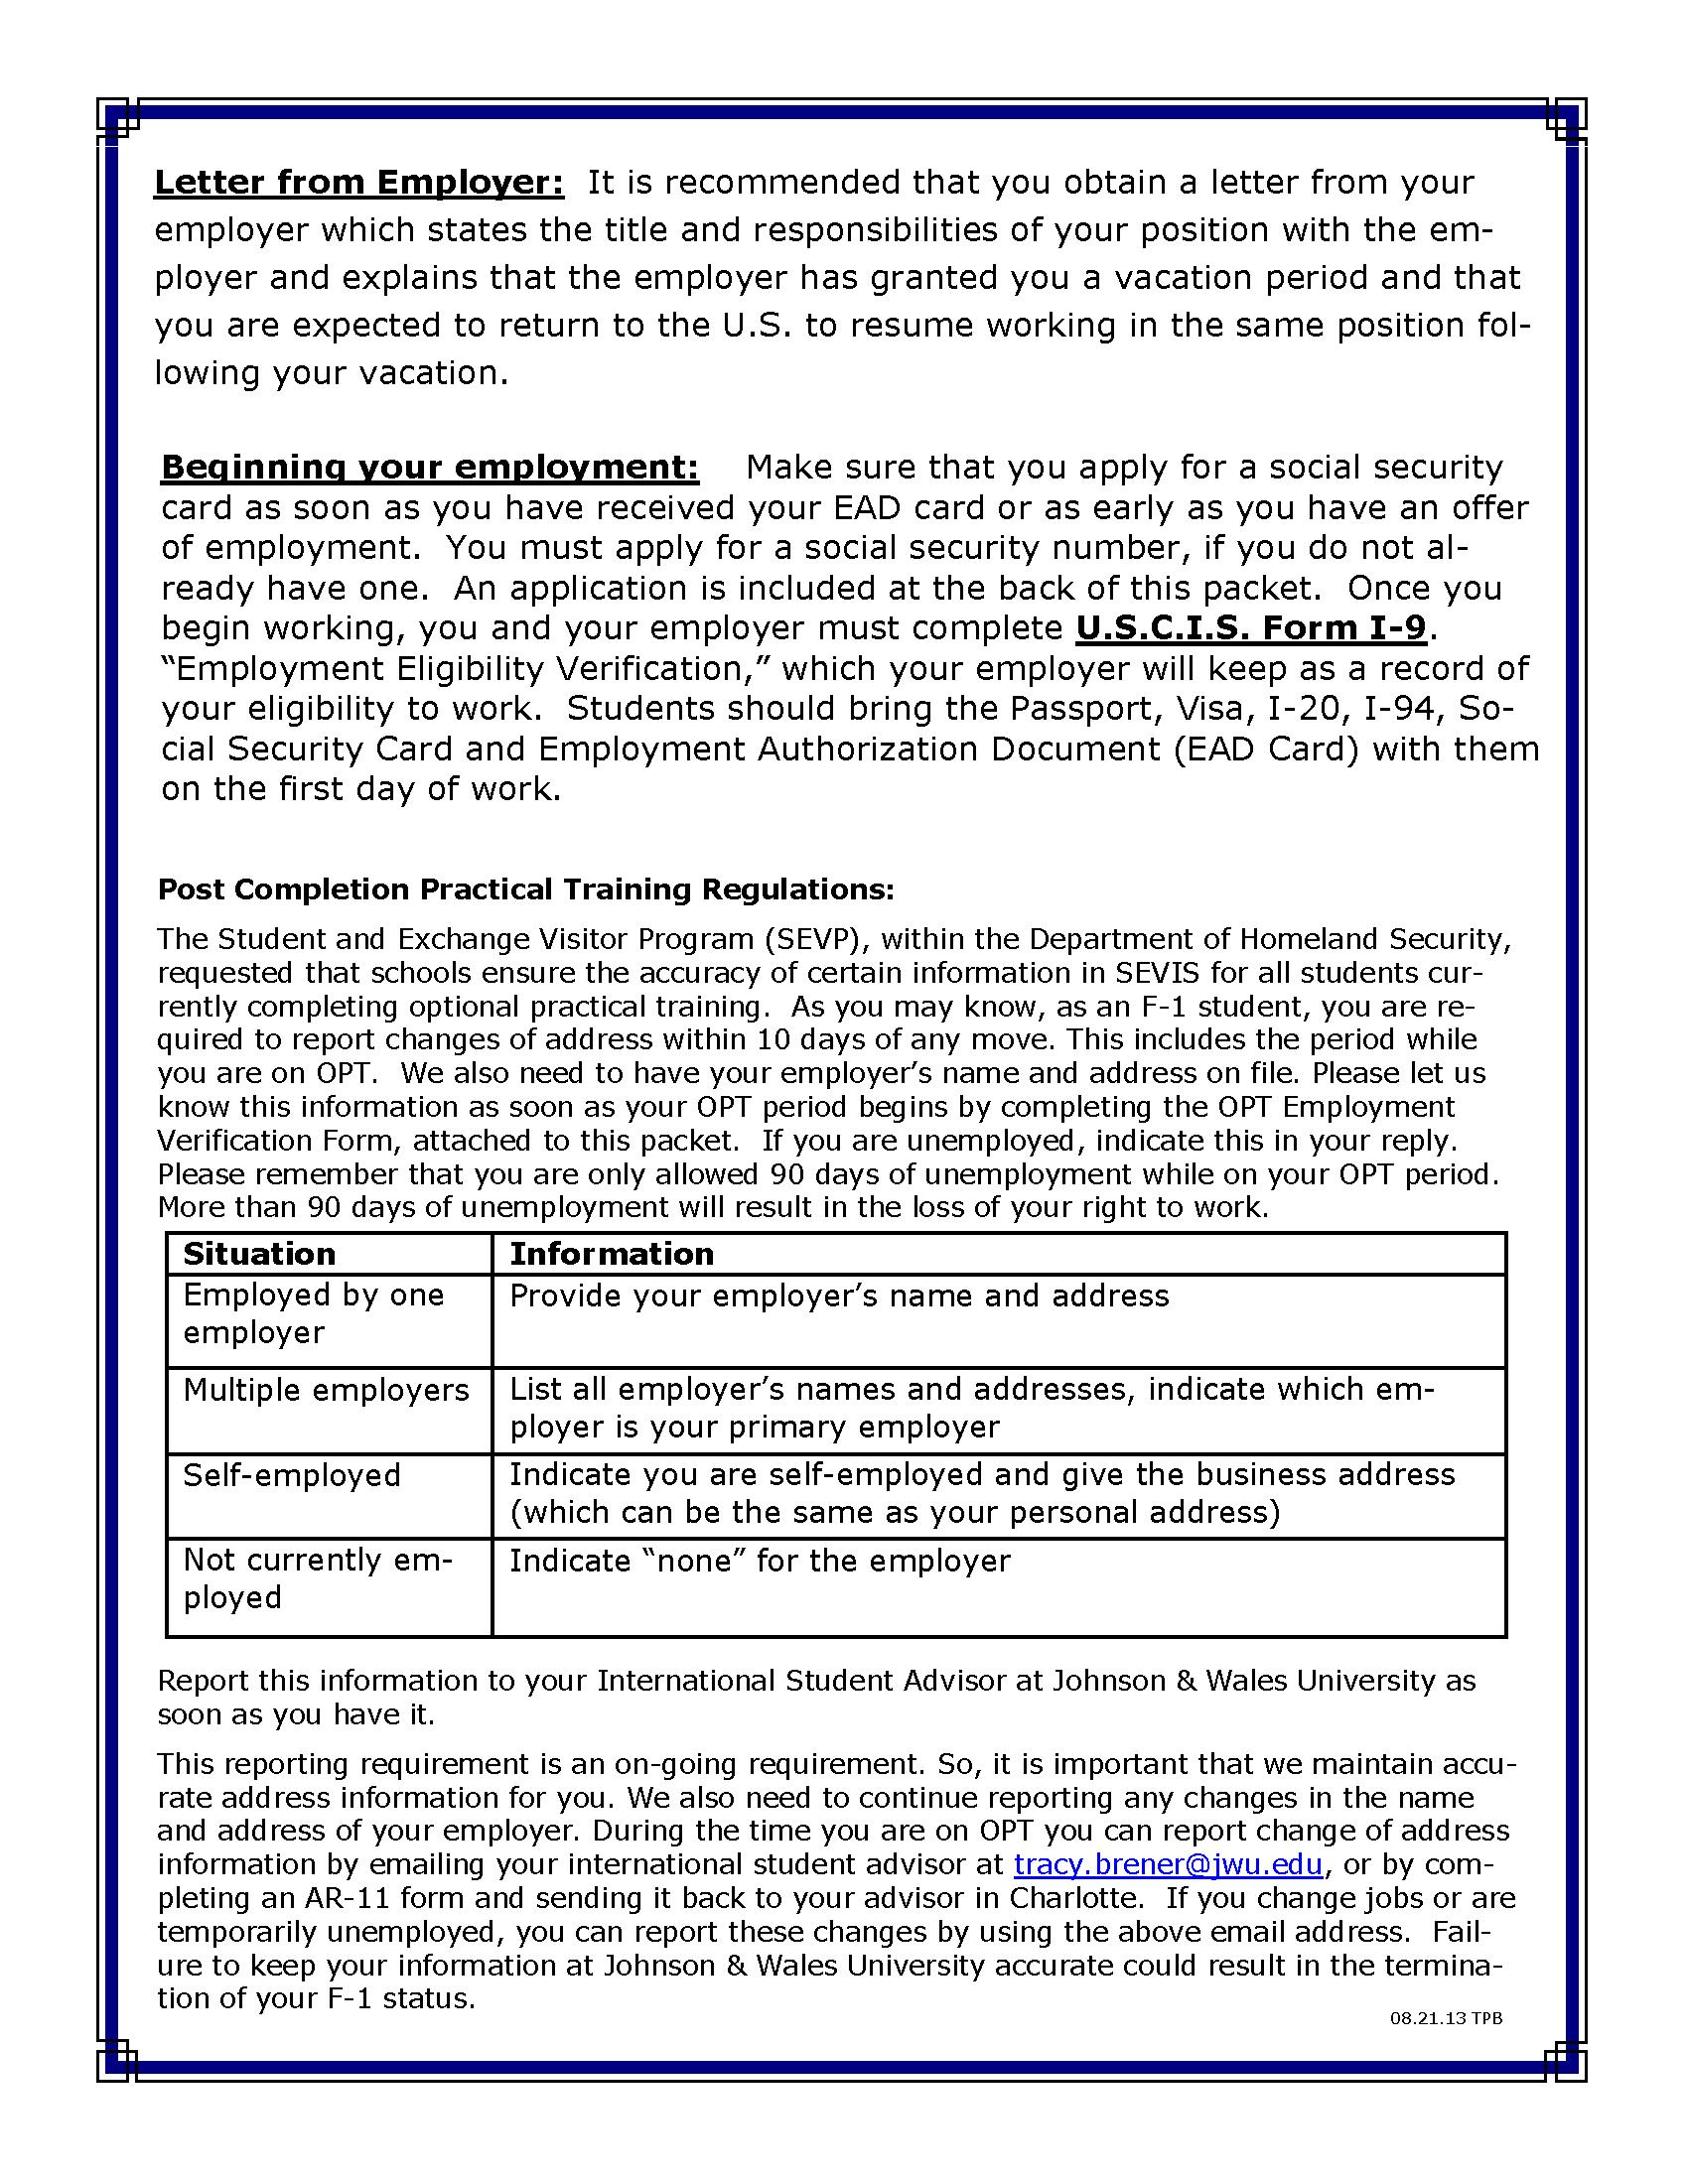 JWU OPT PROGRAM GUIDELINES PAGE 2 OF 2 Resume work